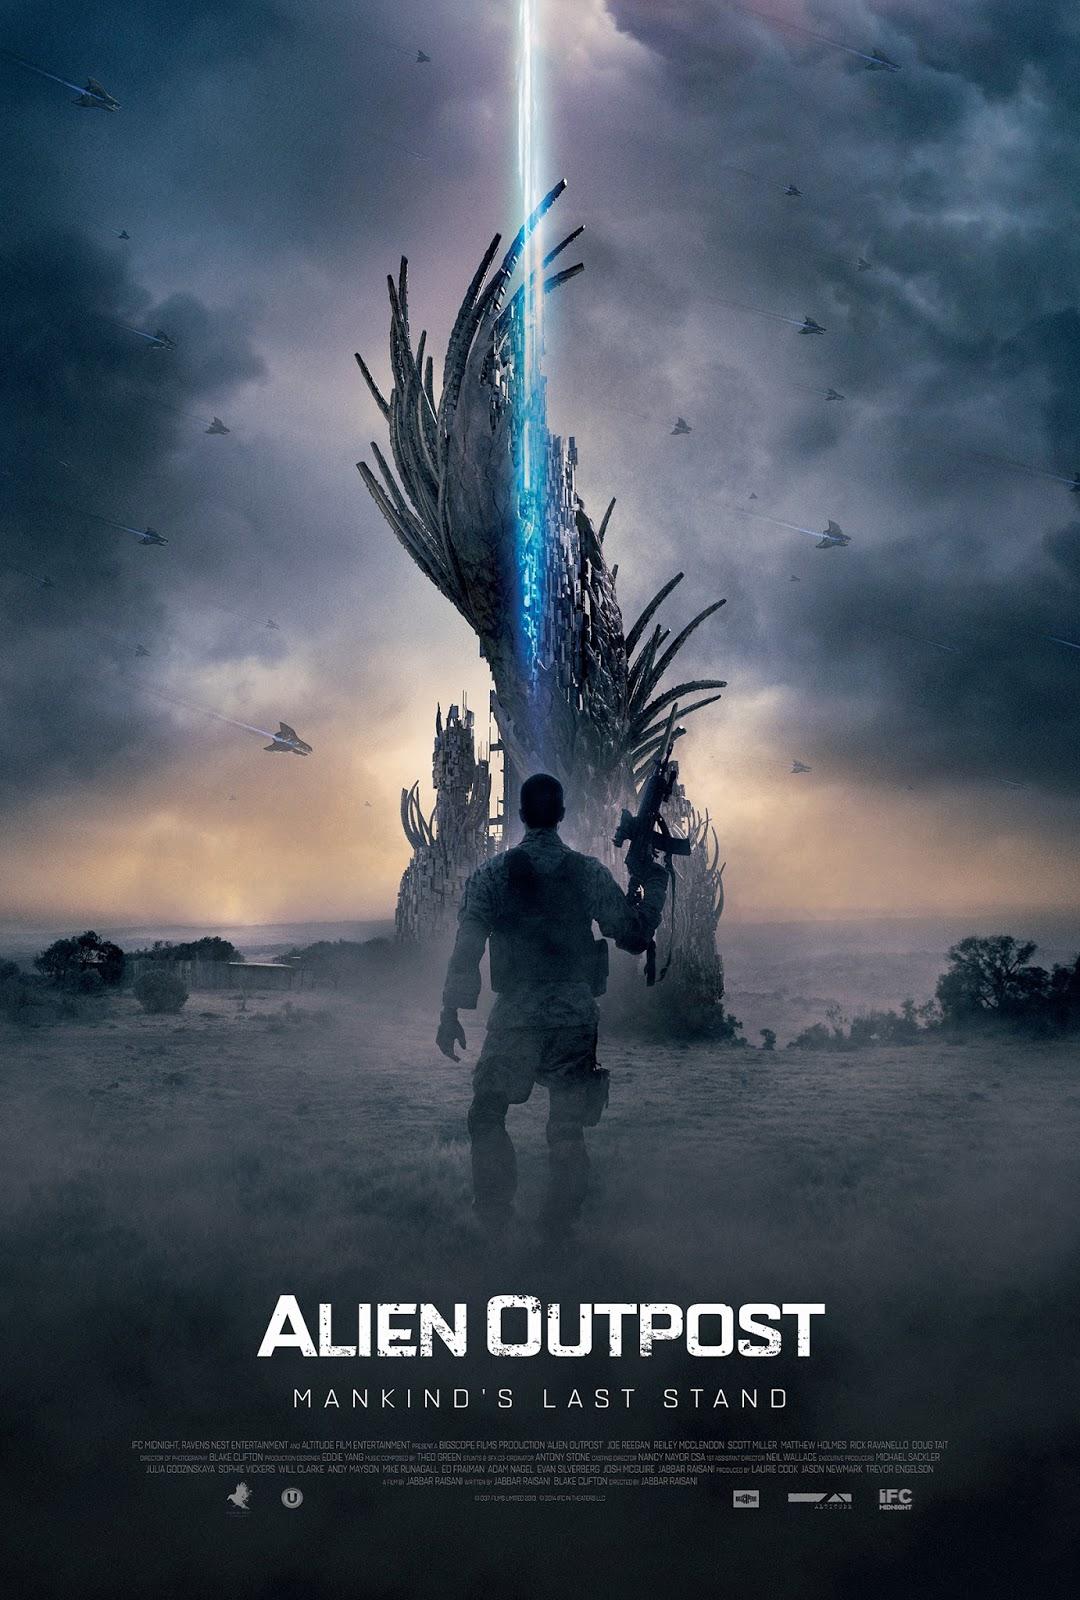 Poster design 101 - Sci Fi Poster Design 101